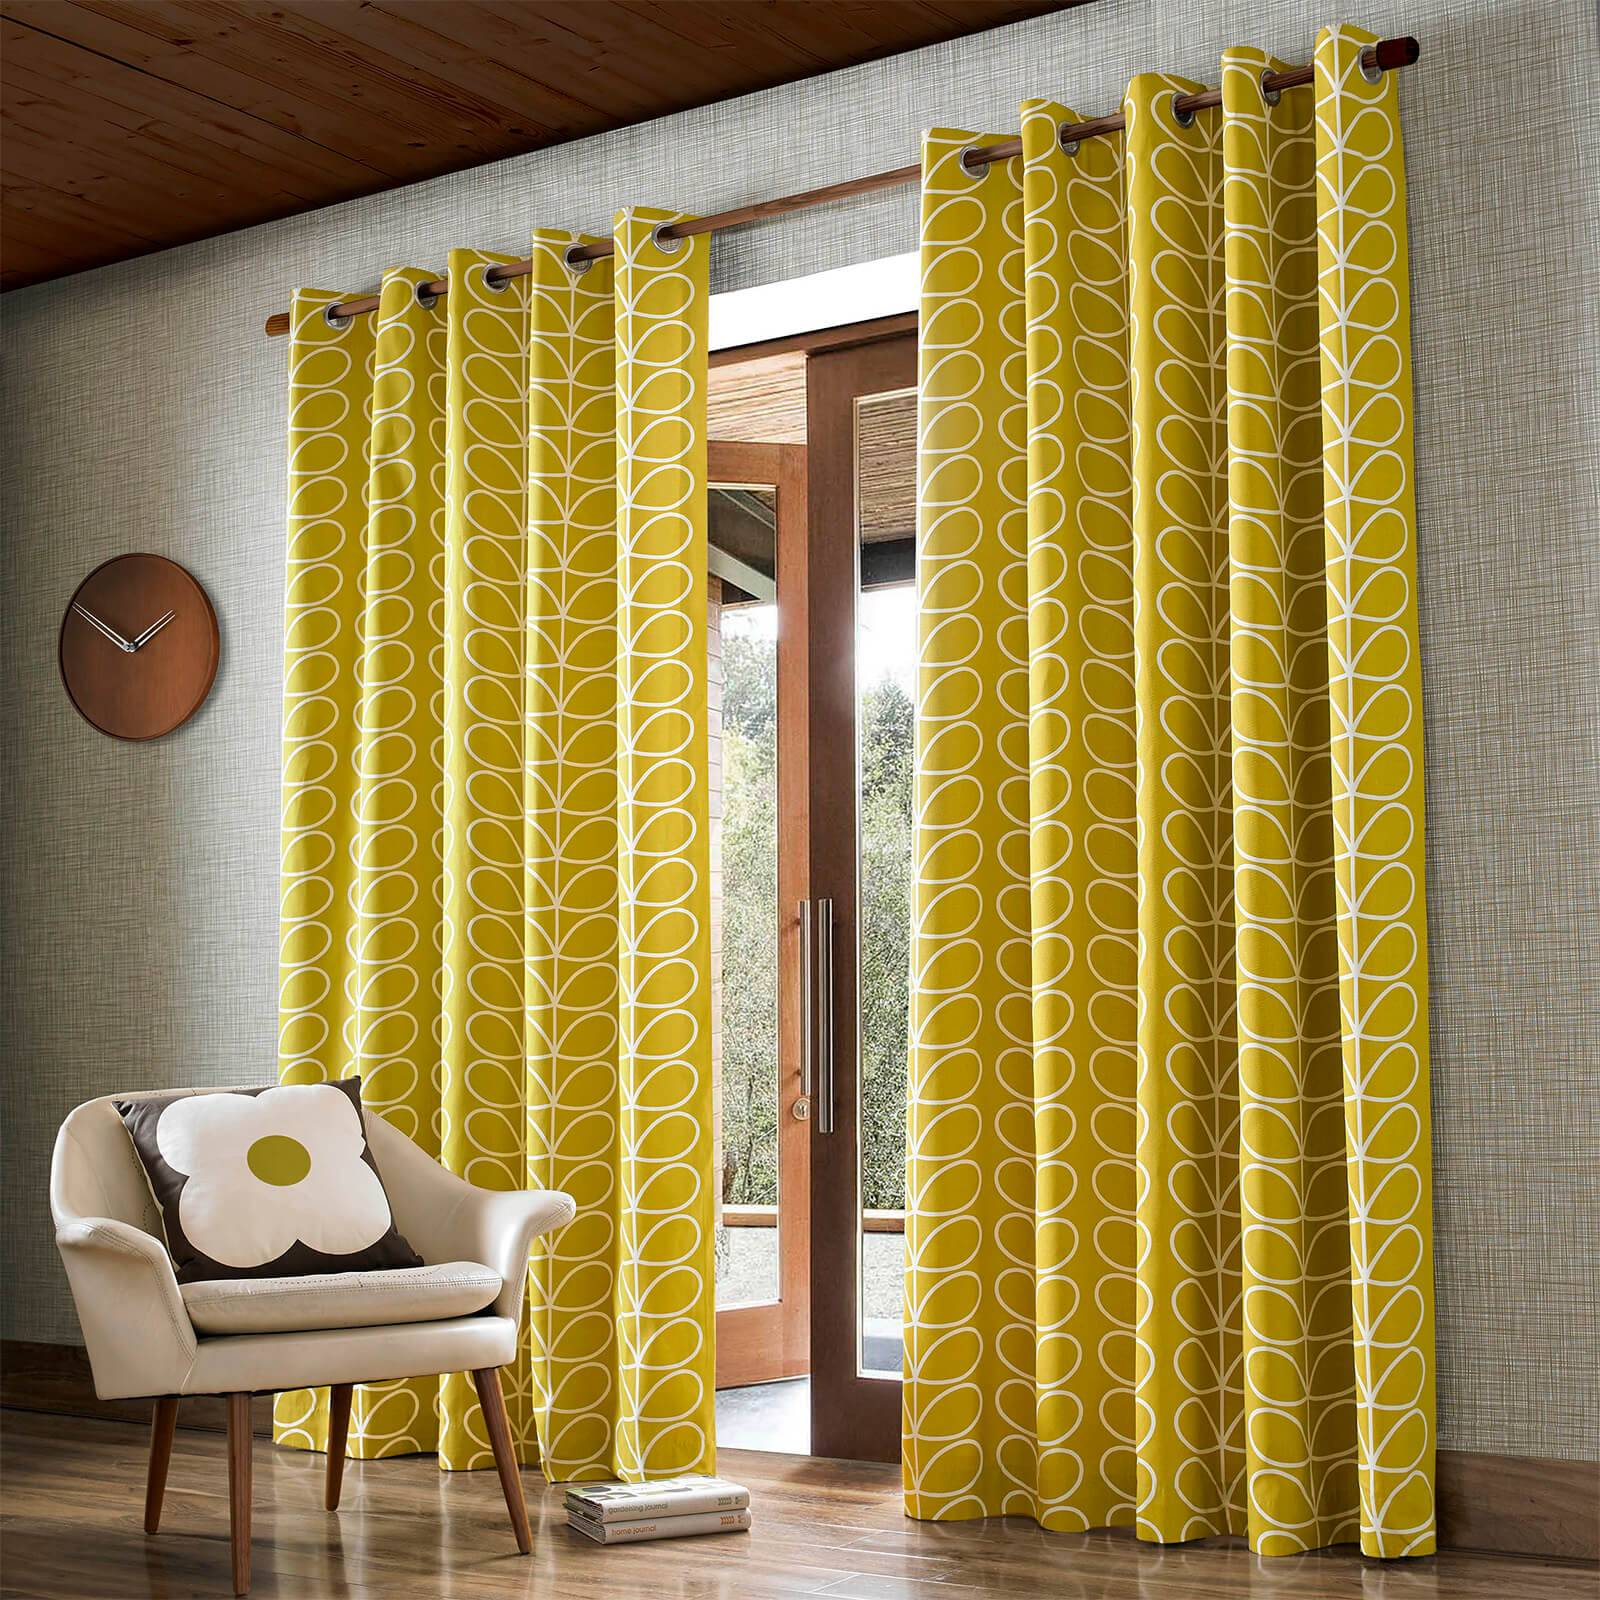 Orla Kiely Linear Stem Curtains - Dandelion - 90 x 72 Inches